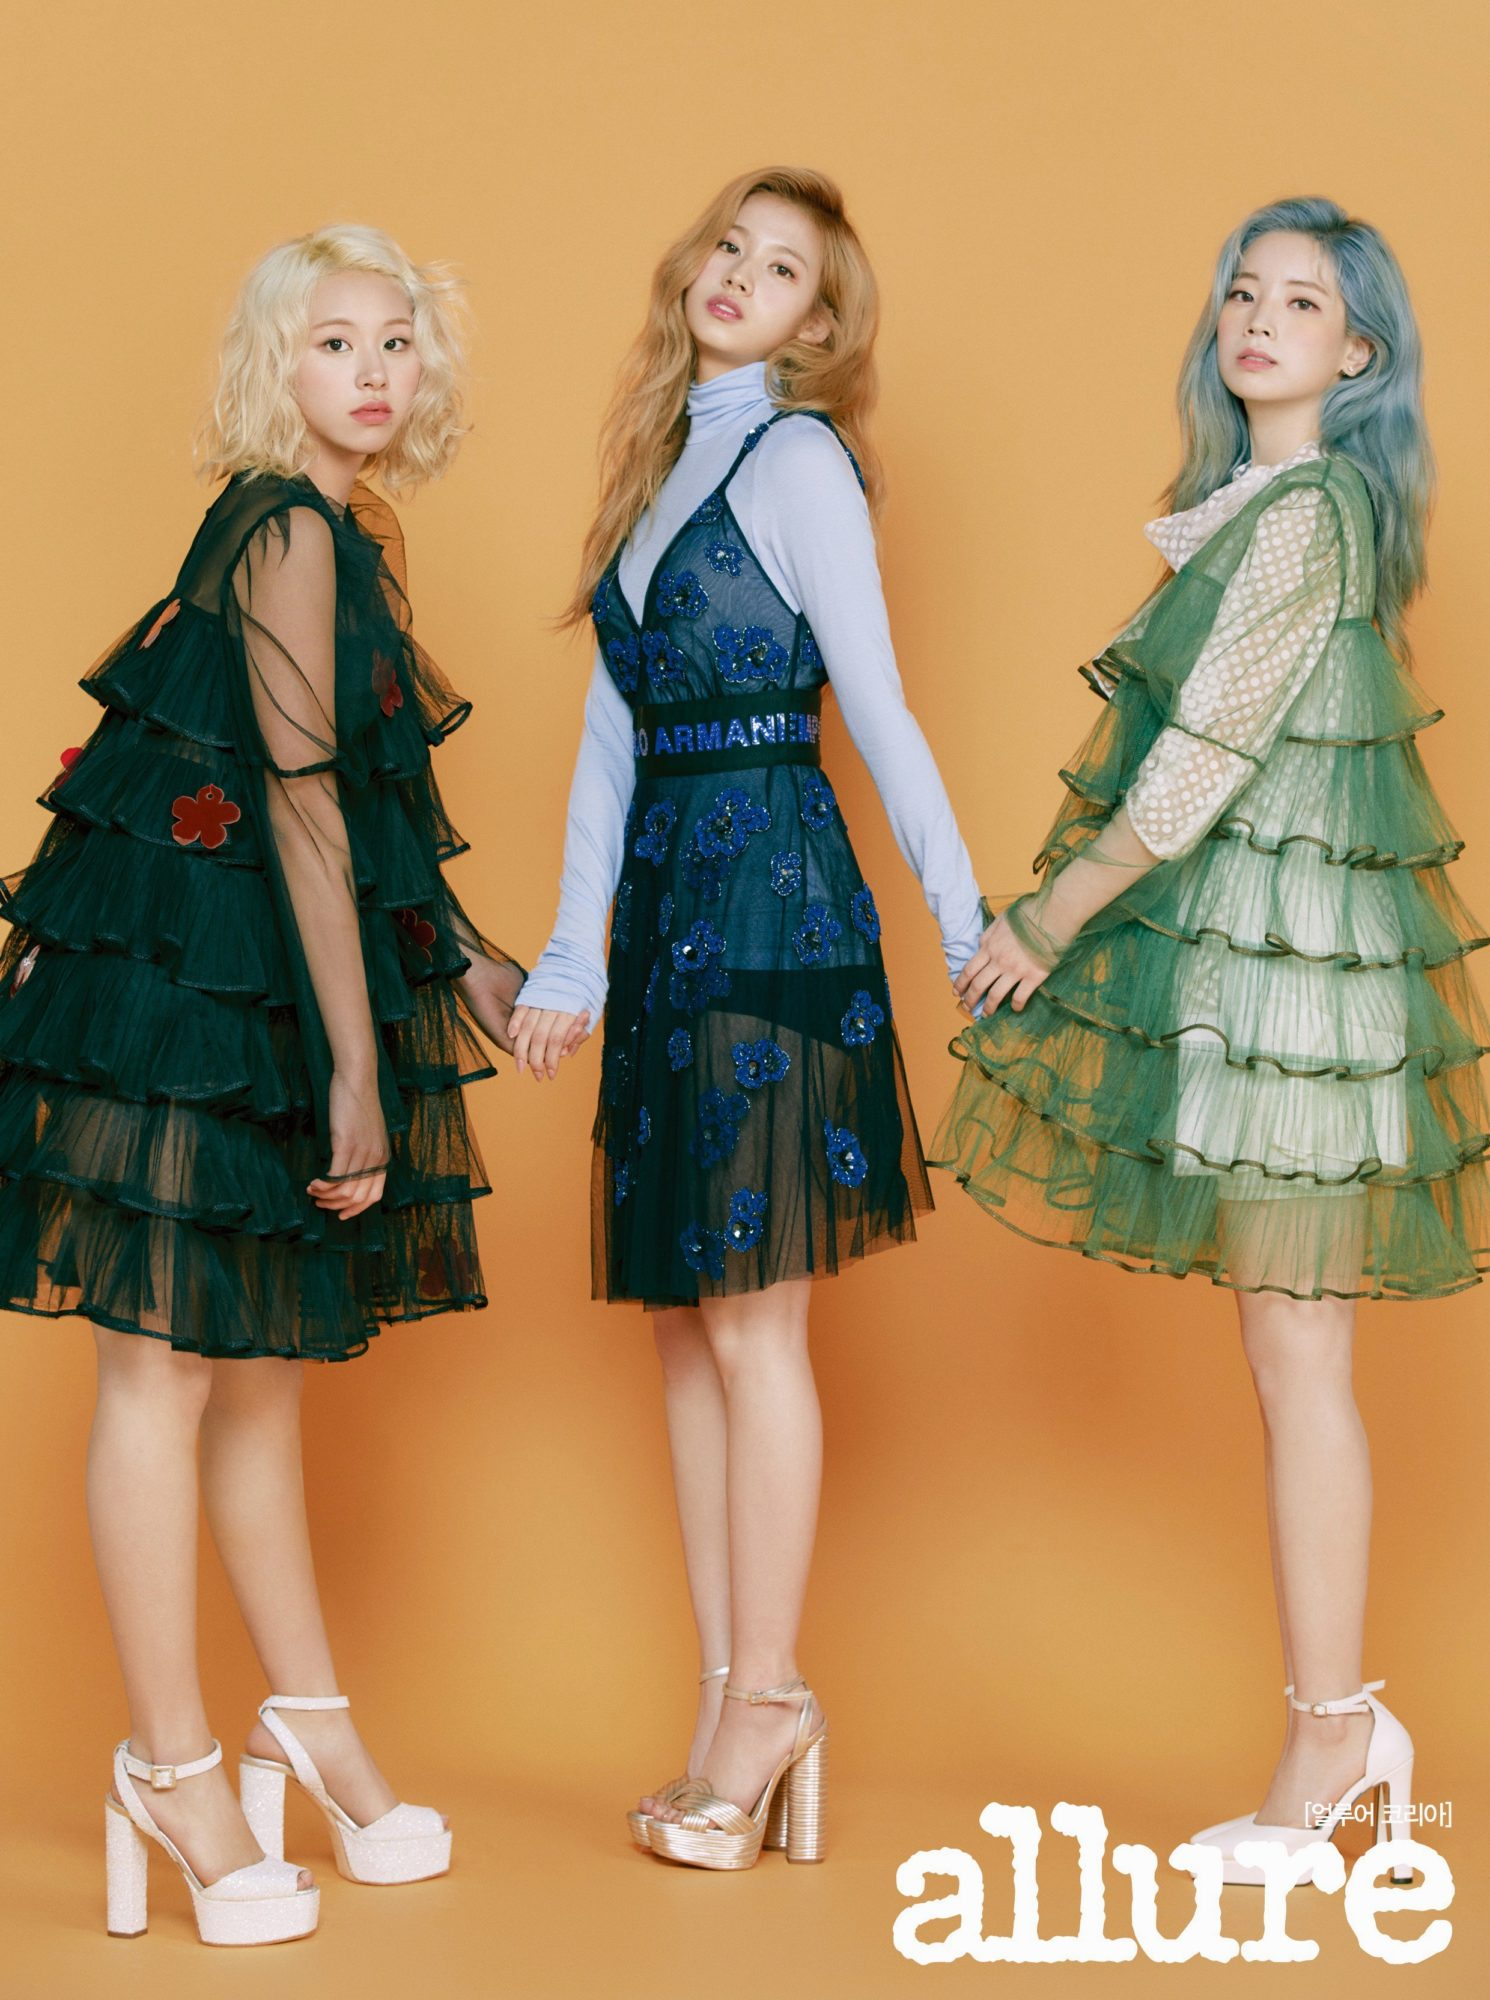 Twice Chaeyoung Sana Dahyun Allure 2019